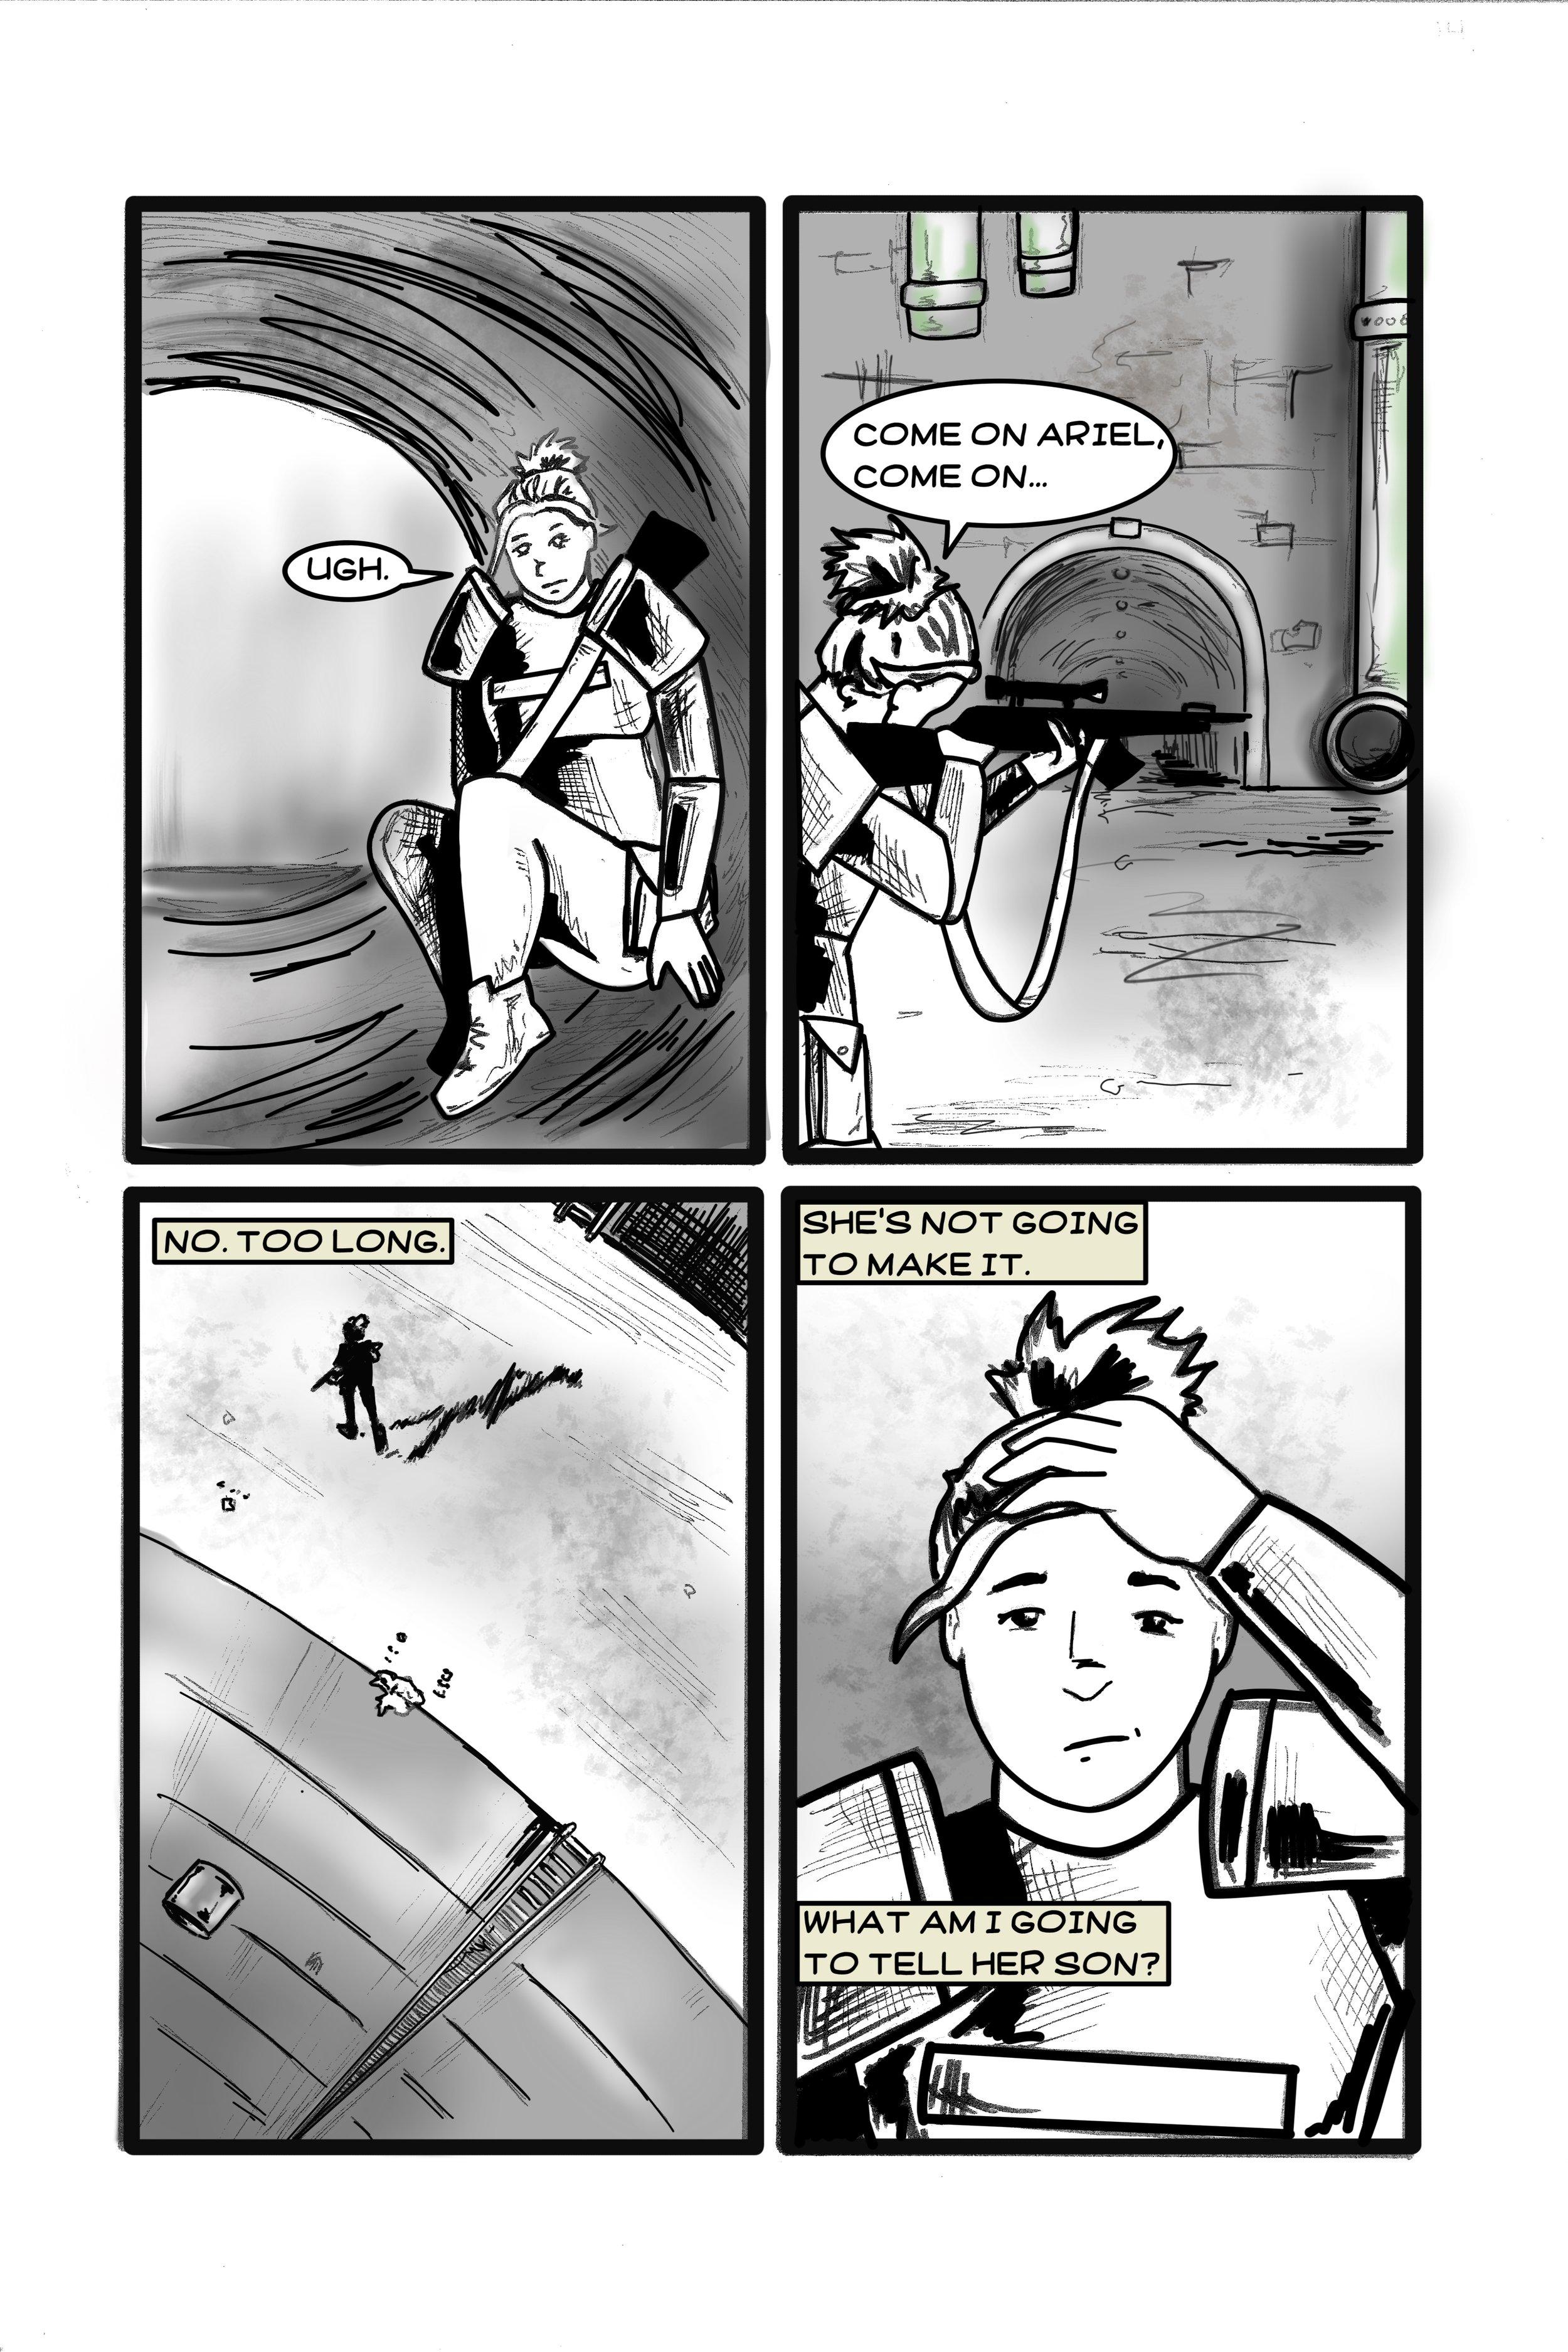 twh page14.jpg